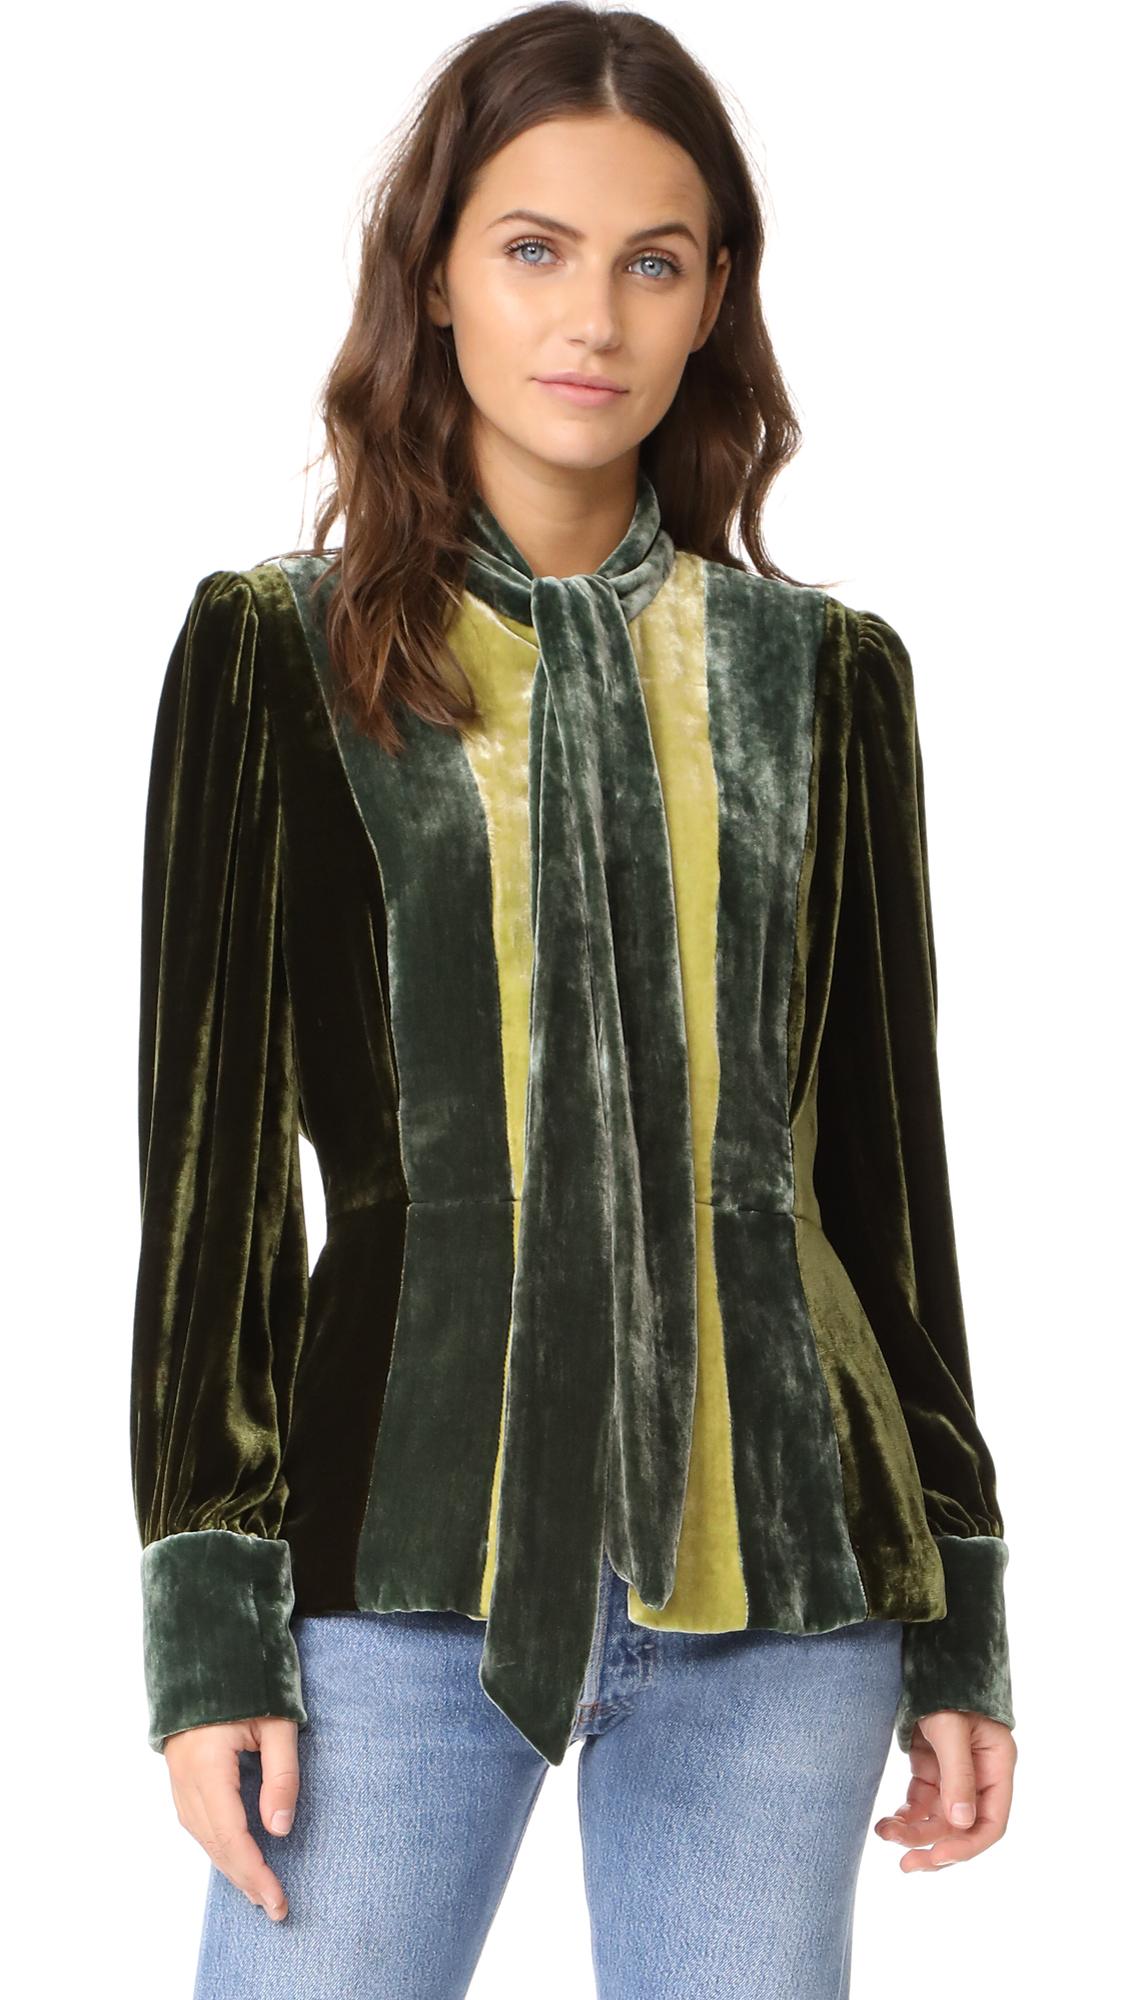 Anna Sui Vintage Velvet Colorblock Jacket - Olive Multi